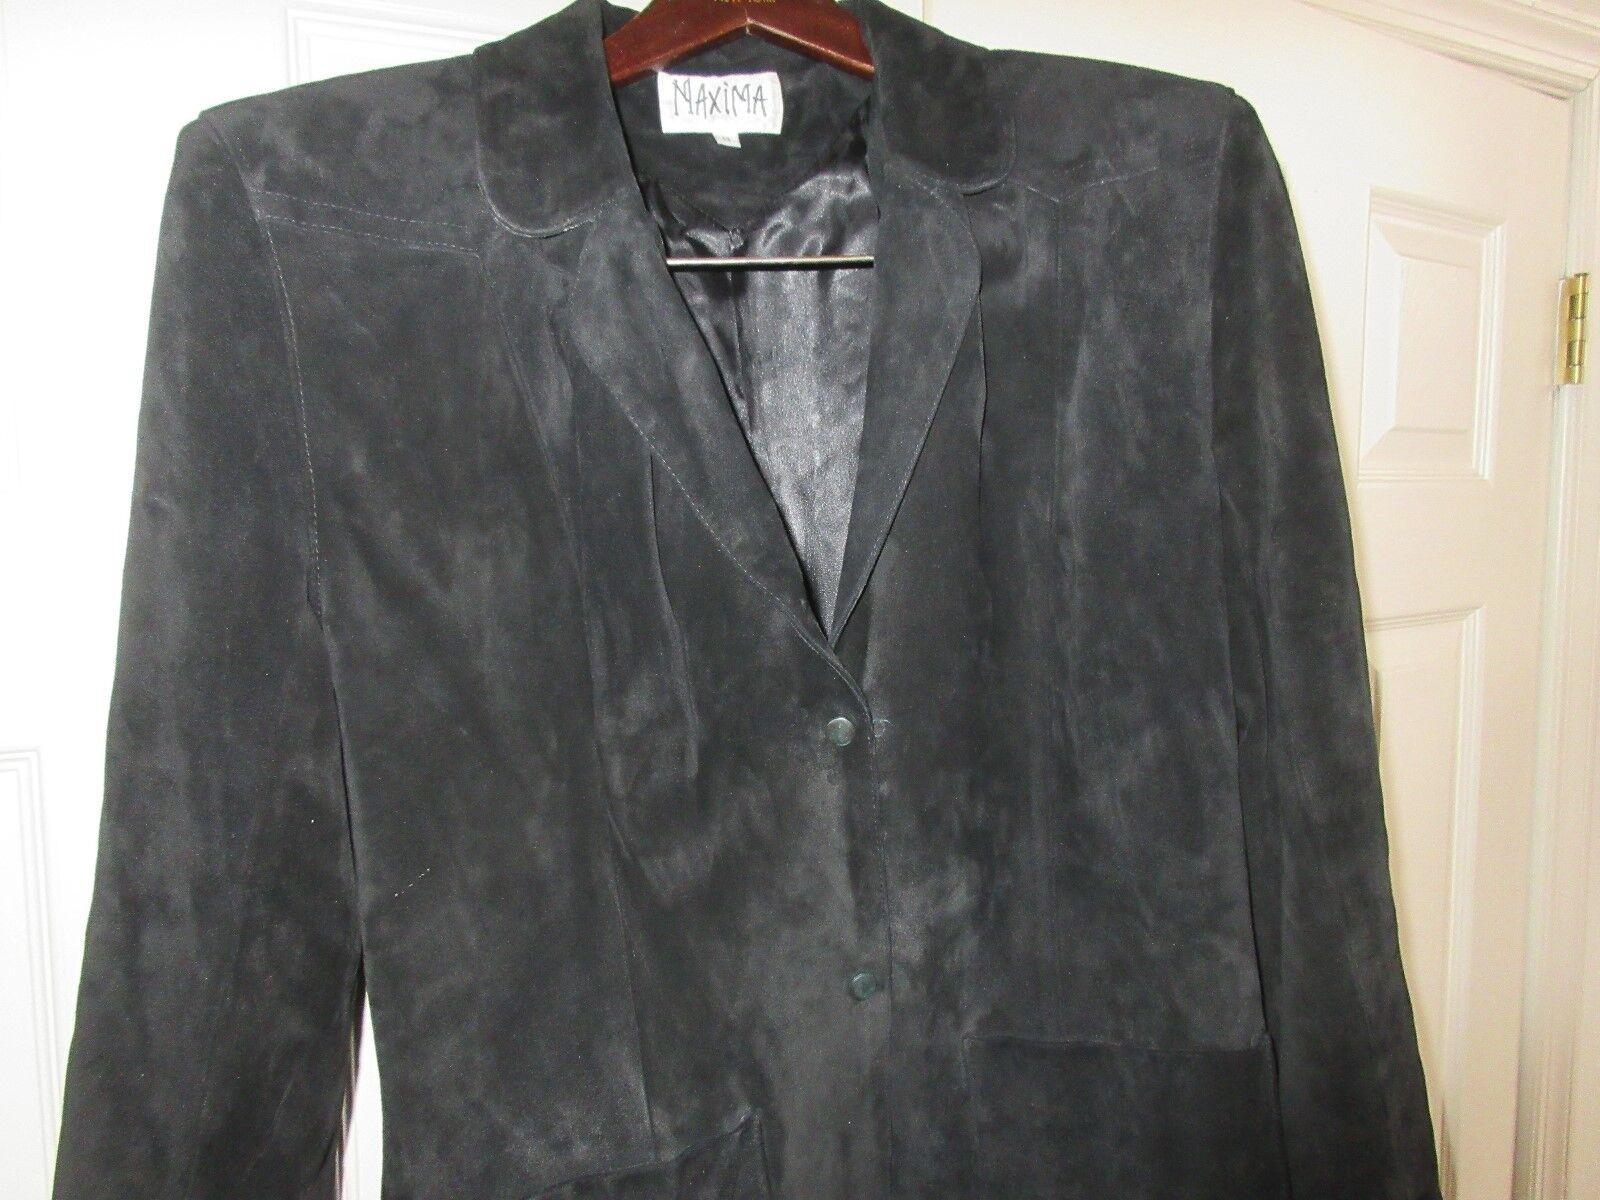 Maxima , Ladies Leather Black Fringed Jacket , Vintage